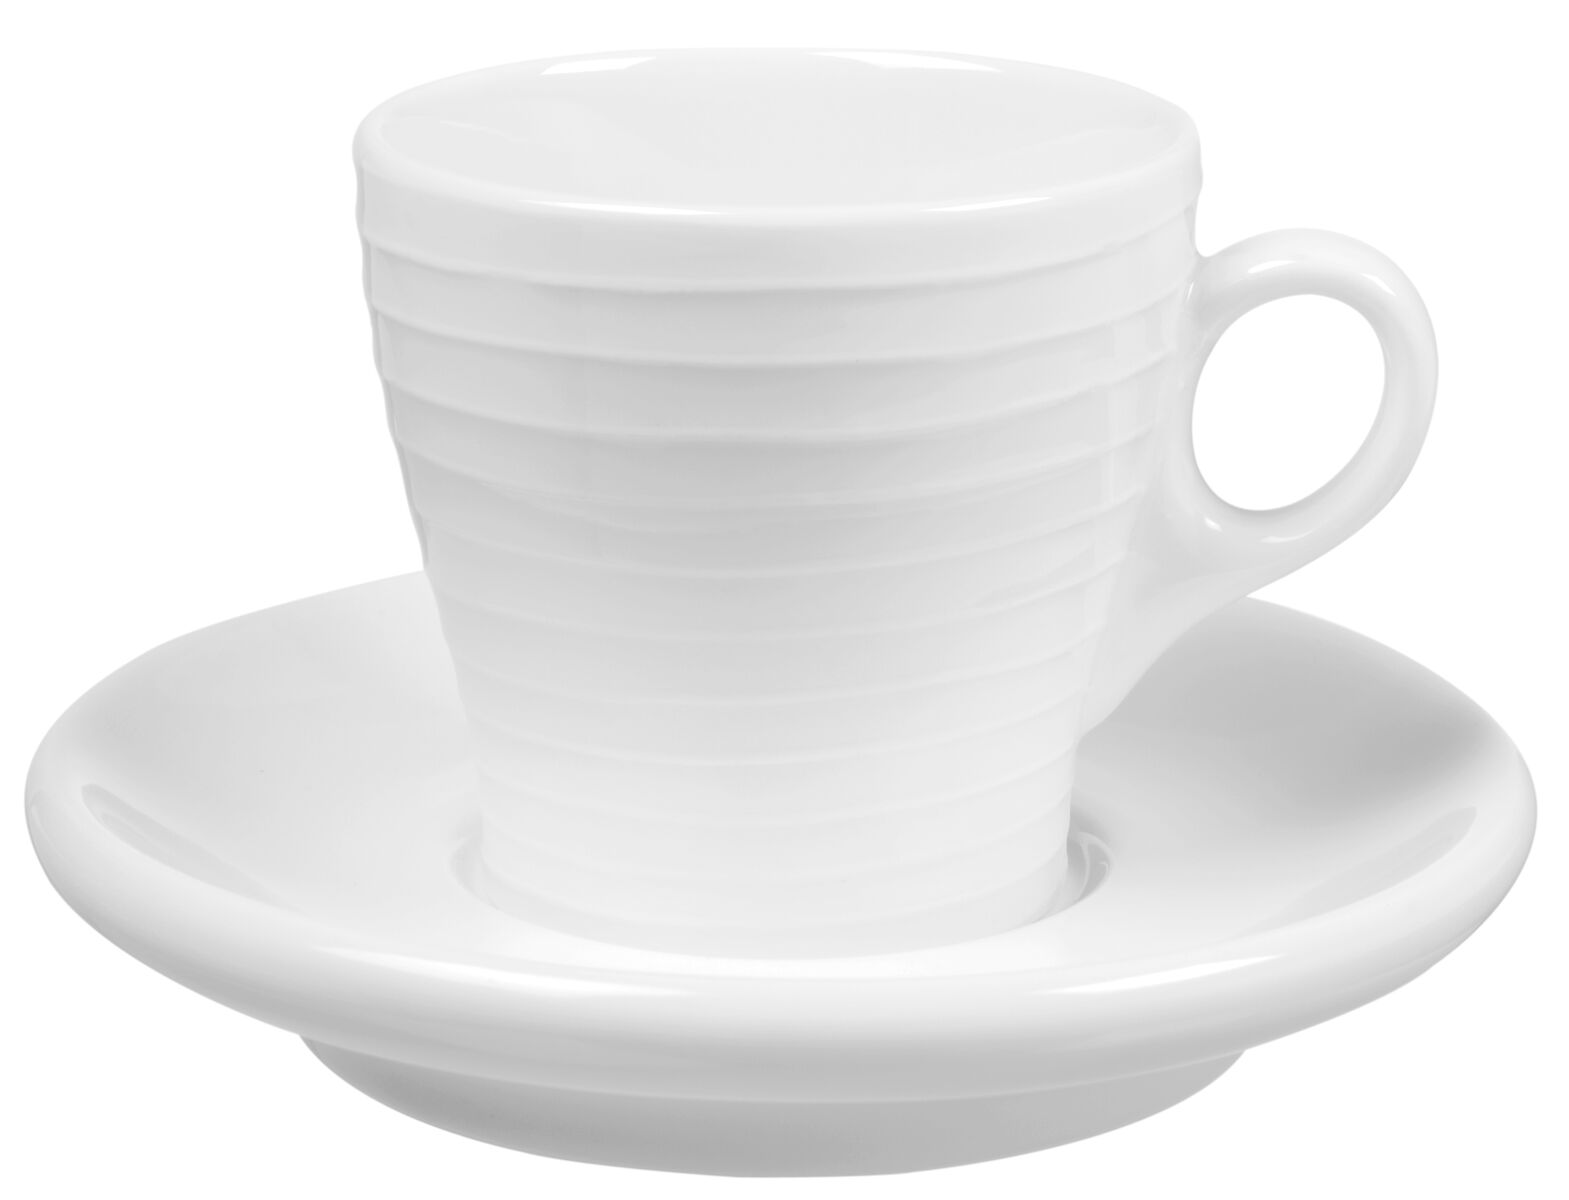 Design House Stockholm Blond Espressokopp med Fat Vit/Randig 10 cl